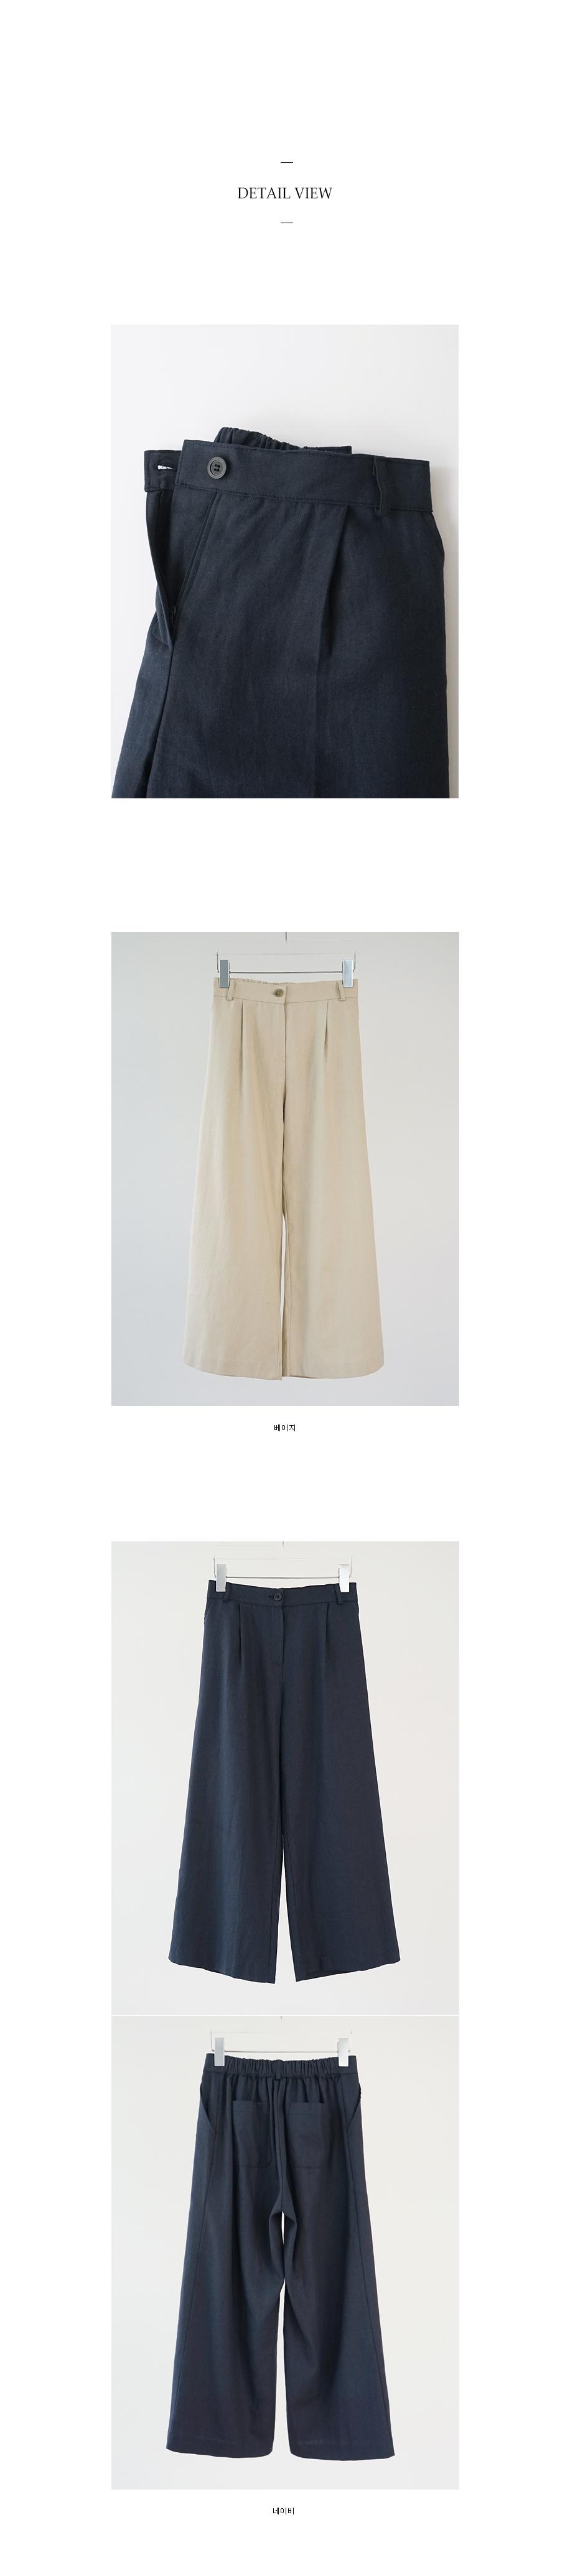 cozy mood linen pants (2colors)